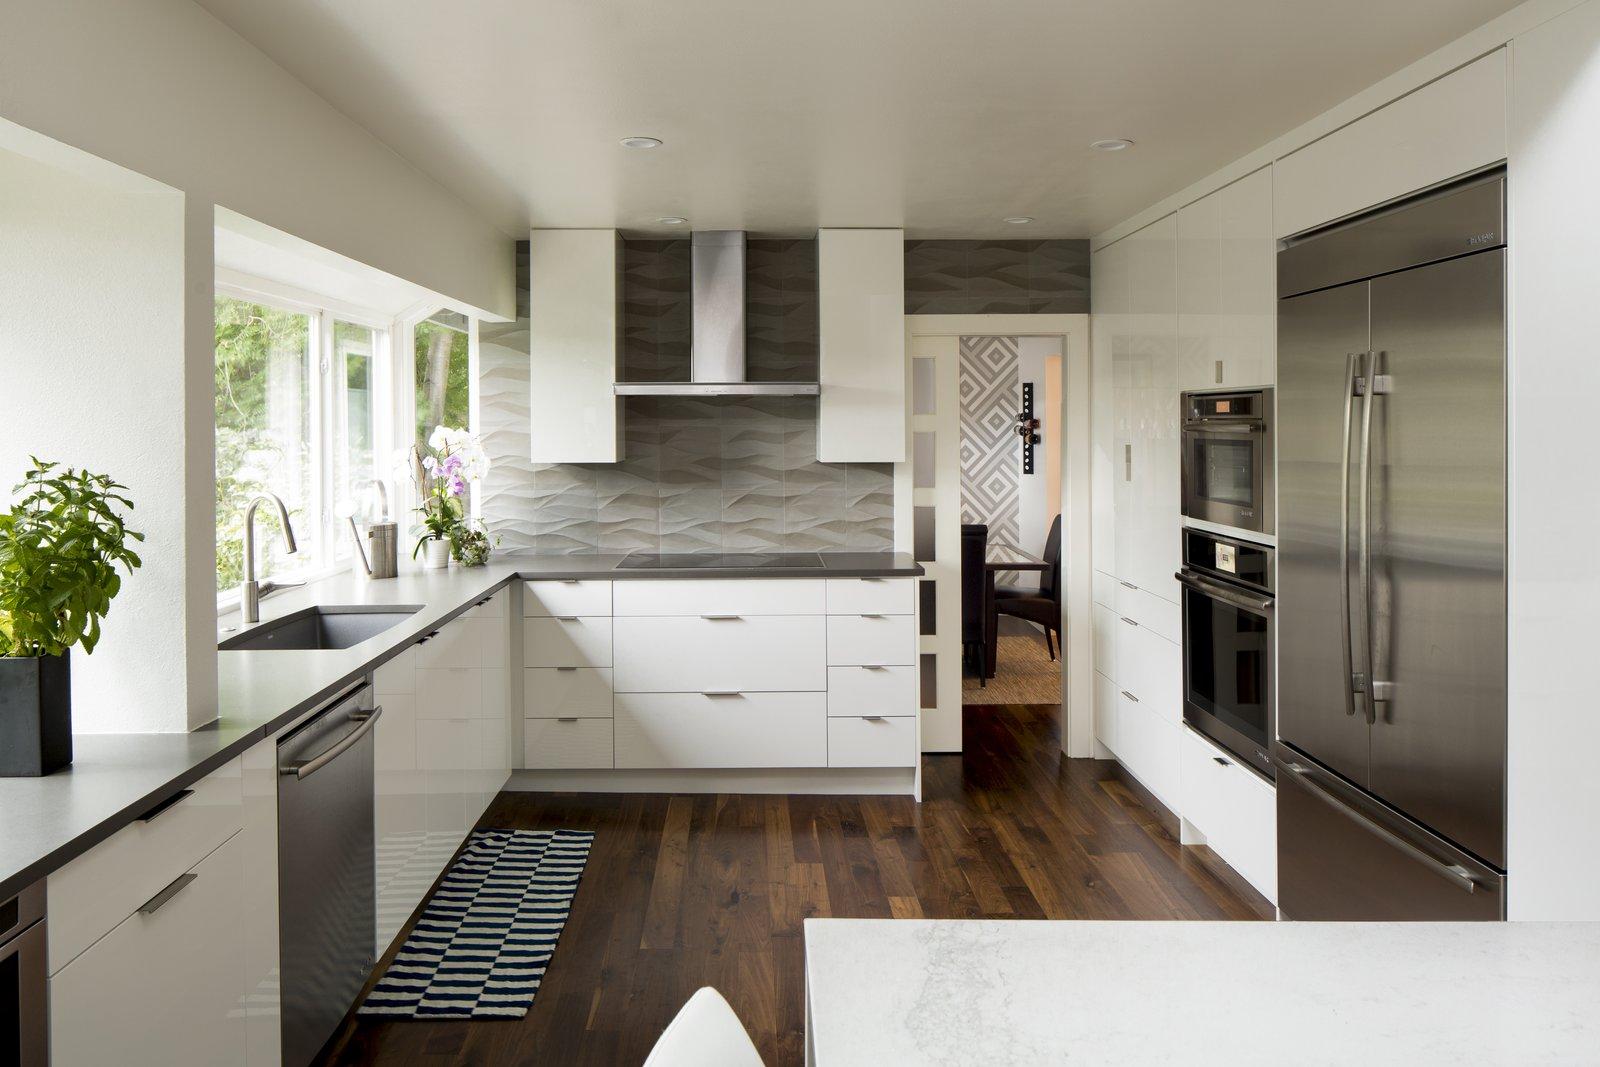 Kitchen, Engineered Quartz Counter, White Cabinet, Dark Hardwood Floor,  Stone Tile Backsplashe